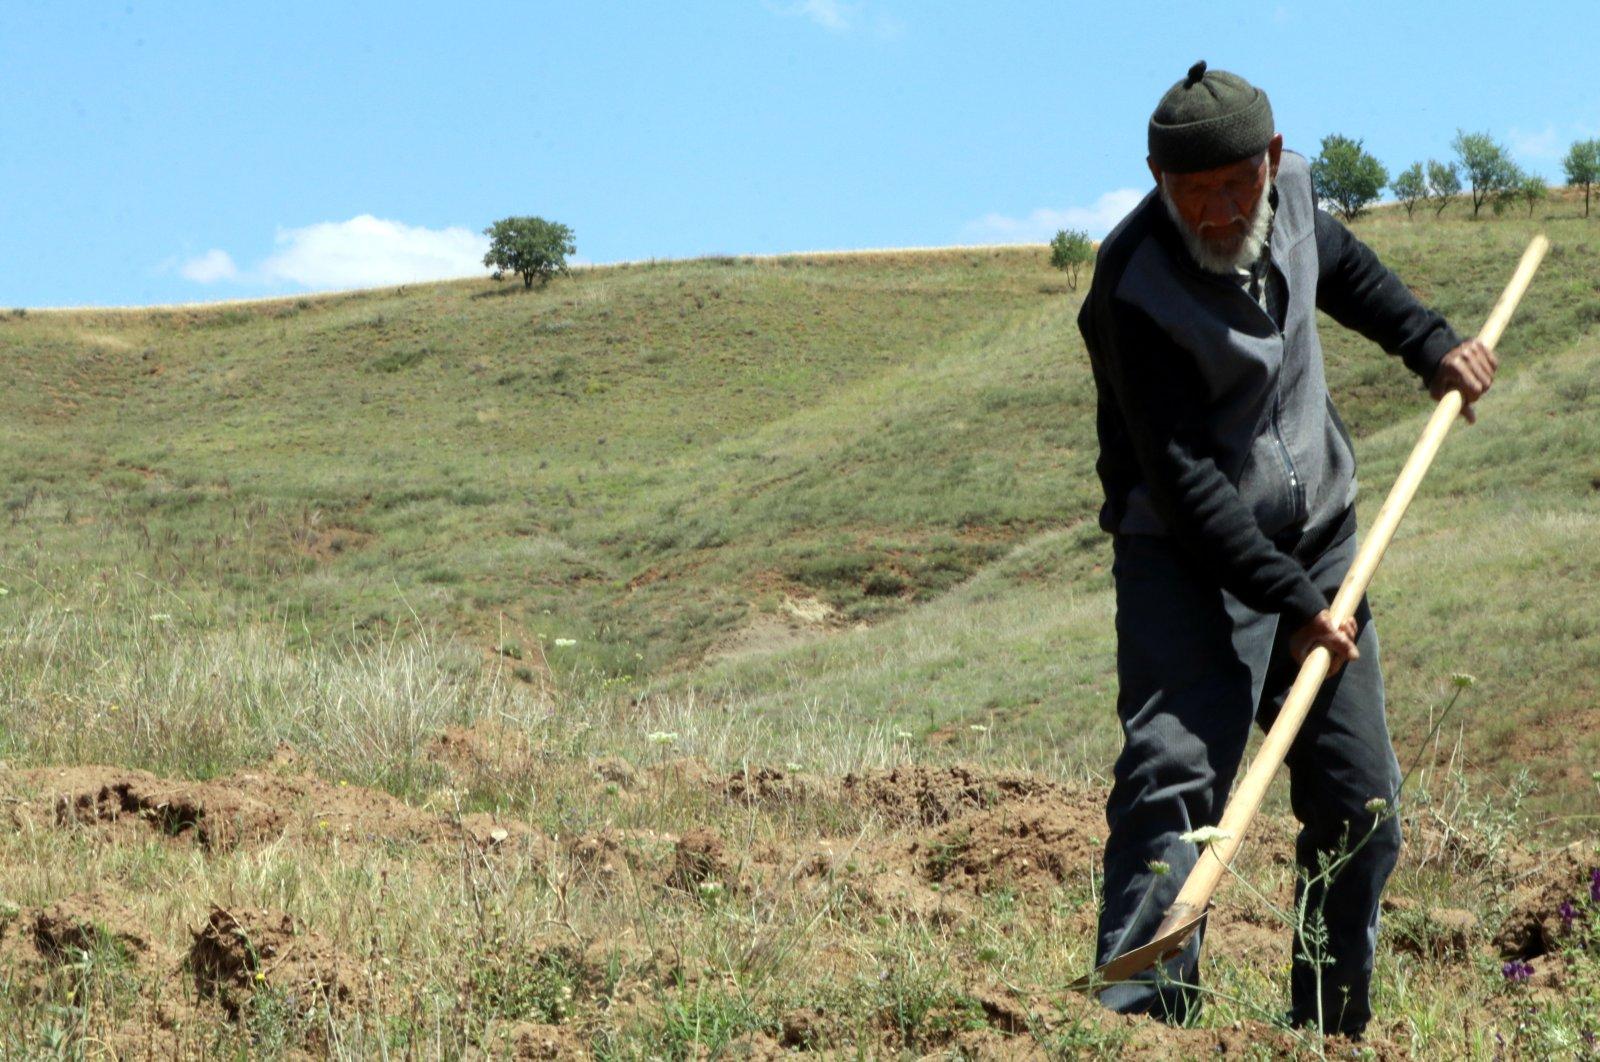 Osman Erol prepares a spot for planting a sapling, in Çankırı, central Turkey, June 28, 2021. (AA PHOTO)